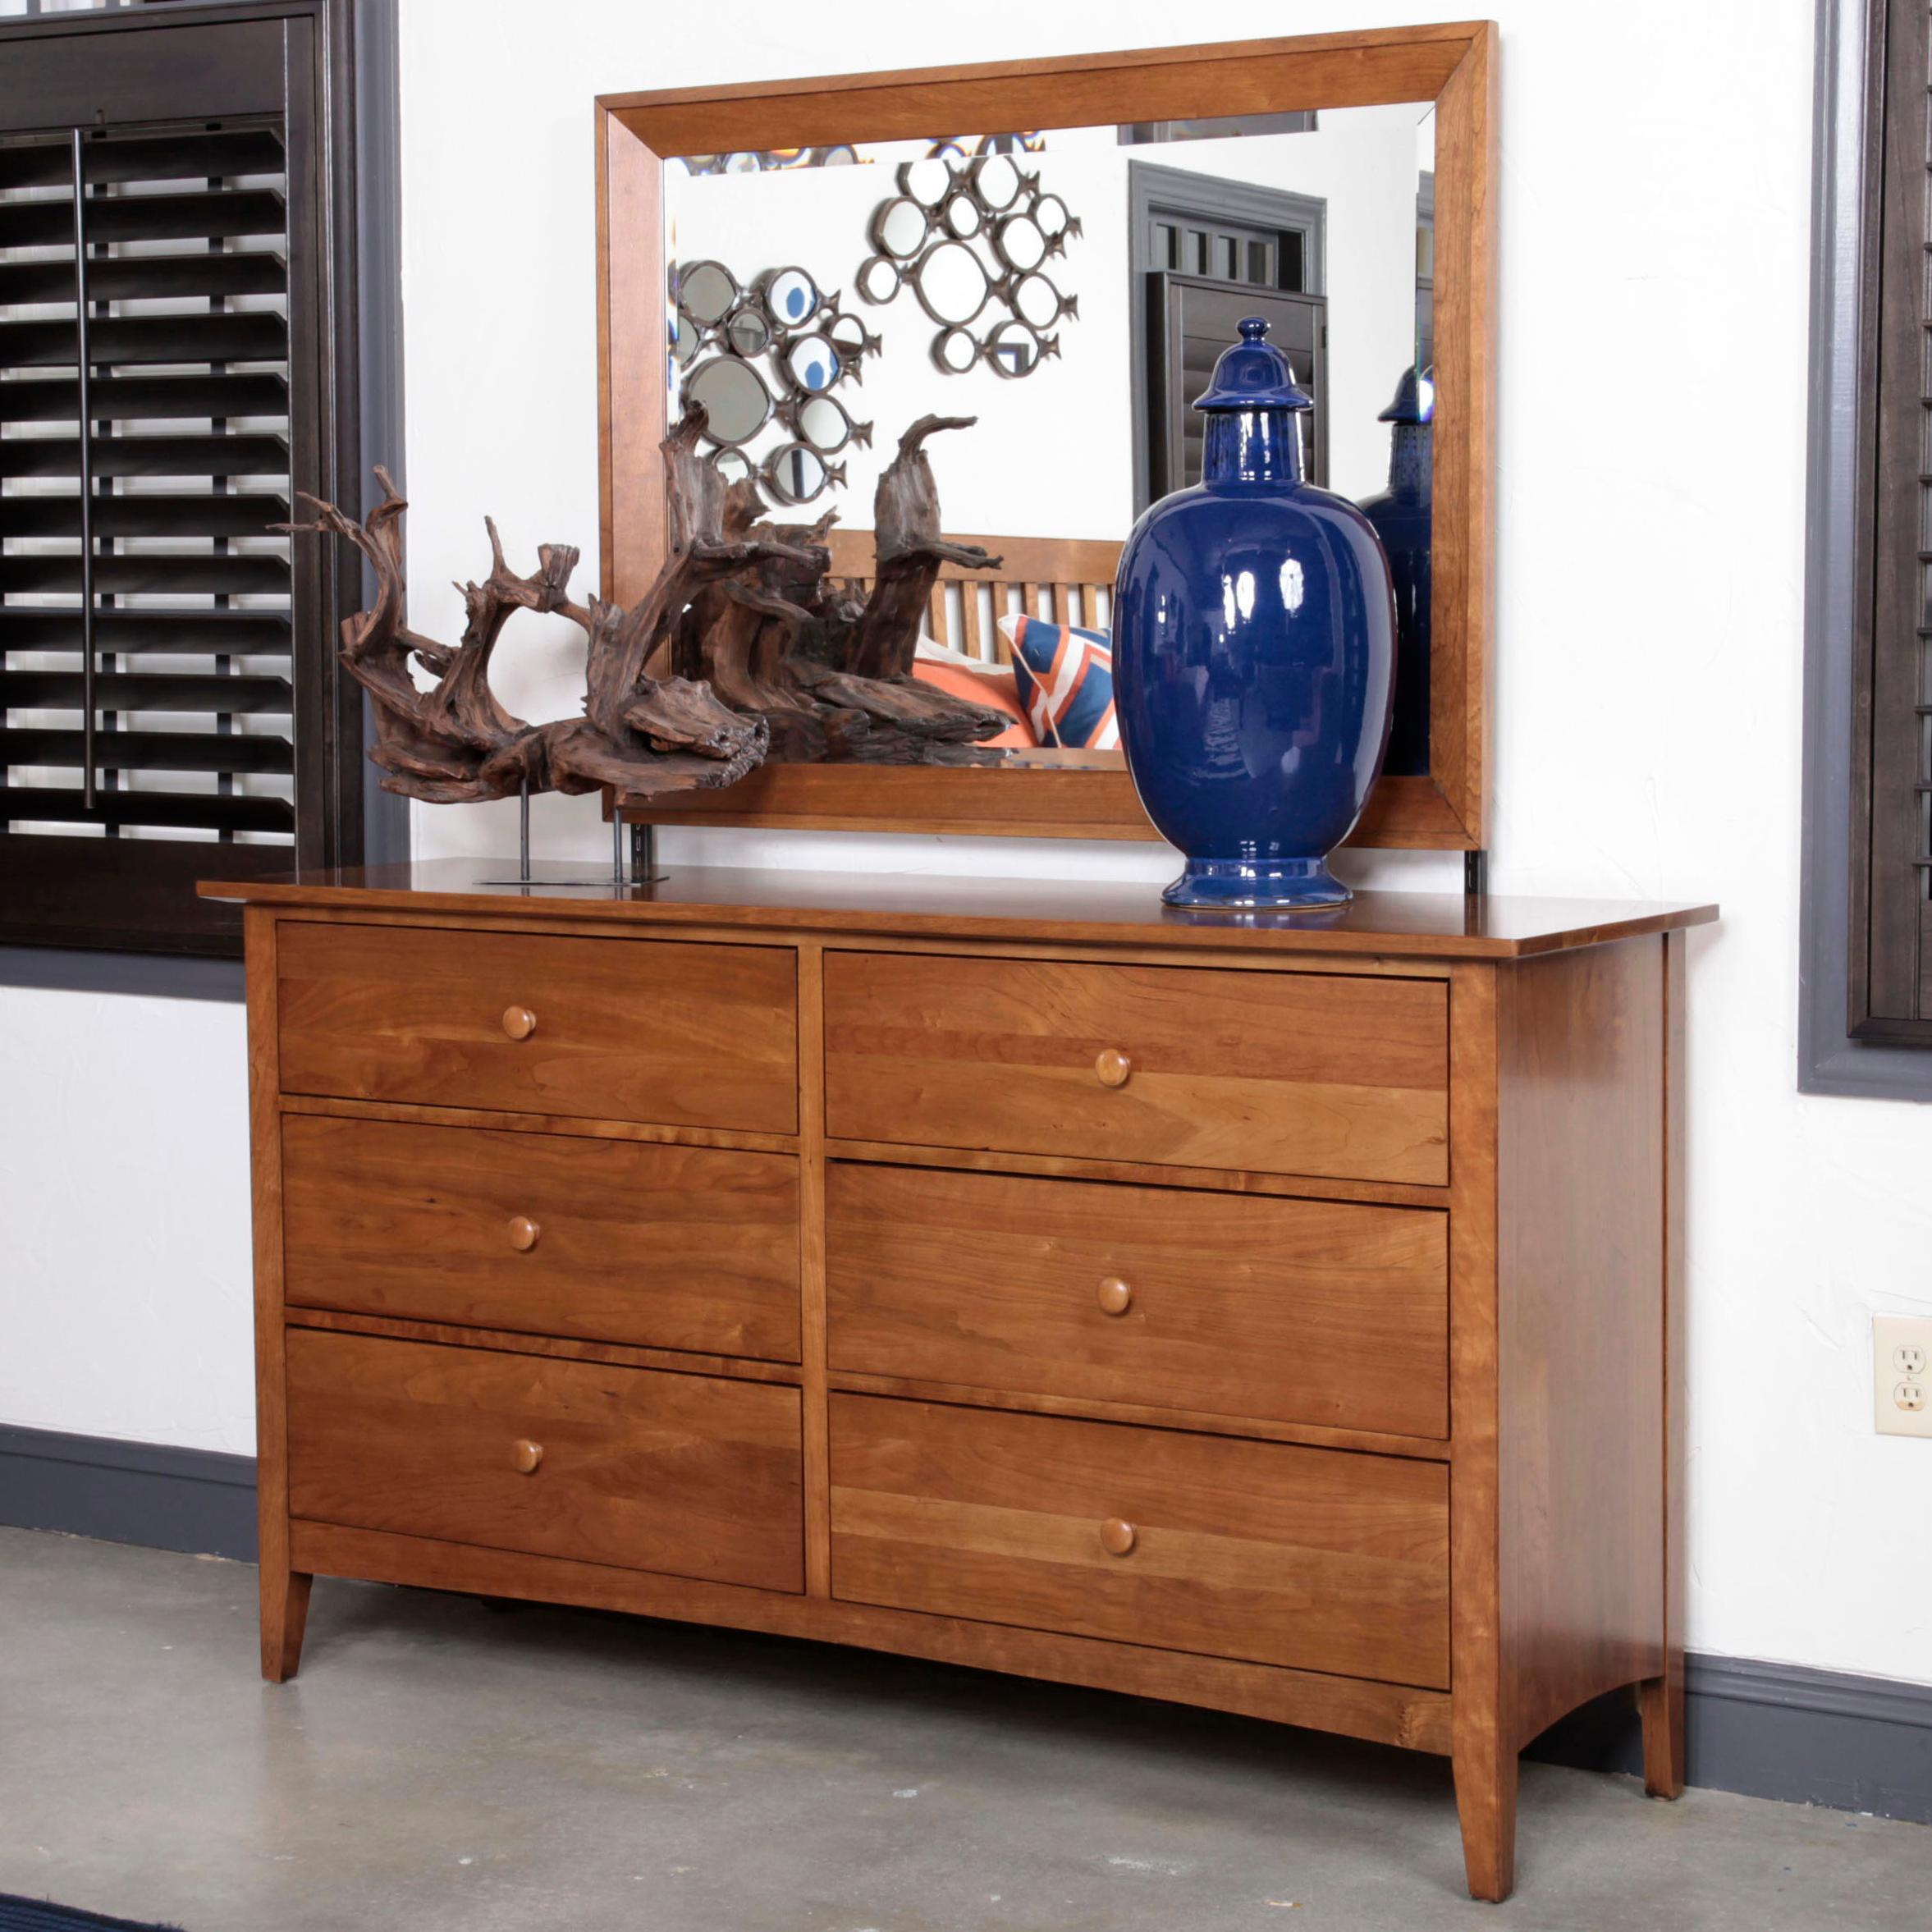 Kincaid Furniture Gatherings 44 0911 Latham Dresser With 6 Drawers Becker Furniture World